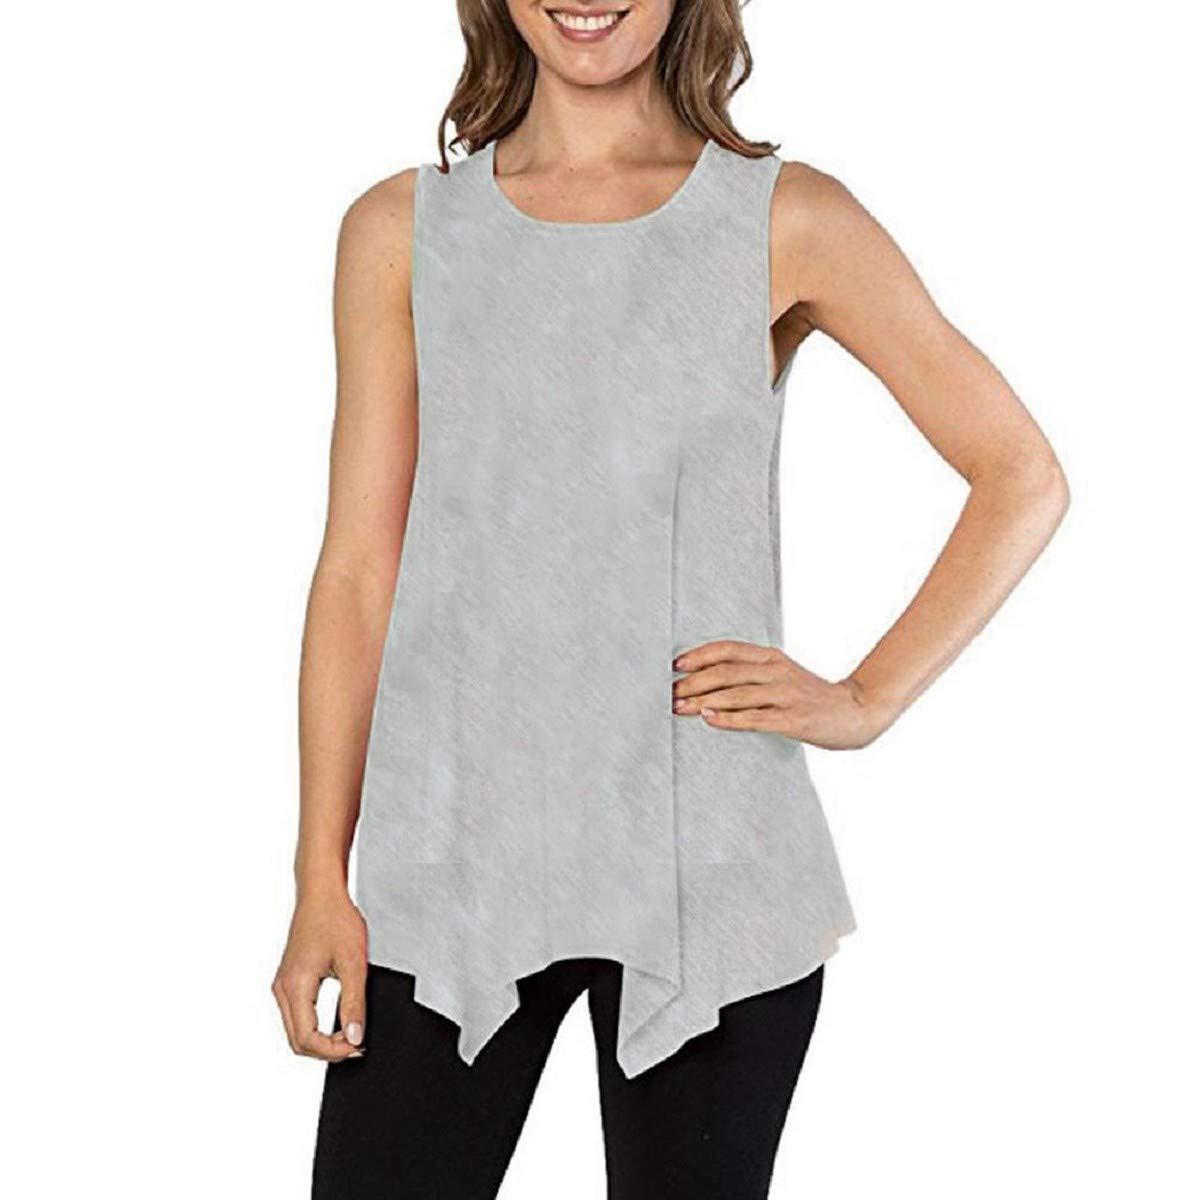 OTINICE Women Blouse, Plus Size Summer Tunic Tank Top Sleeveless Loose Basic Tee Shirts Khaki